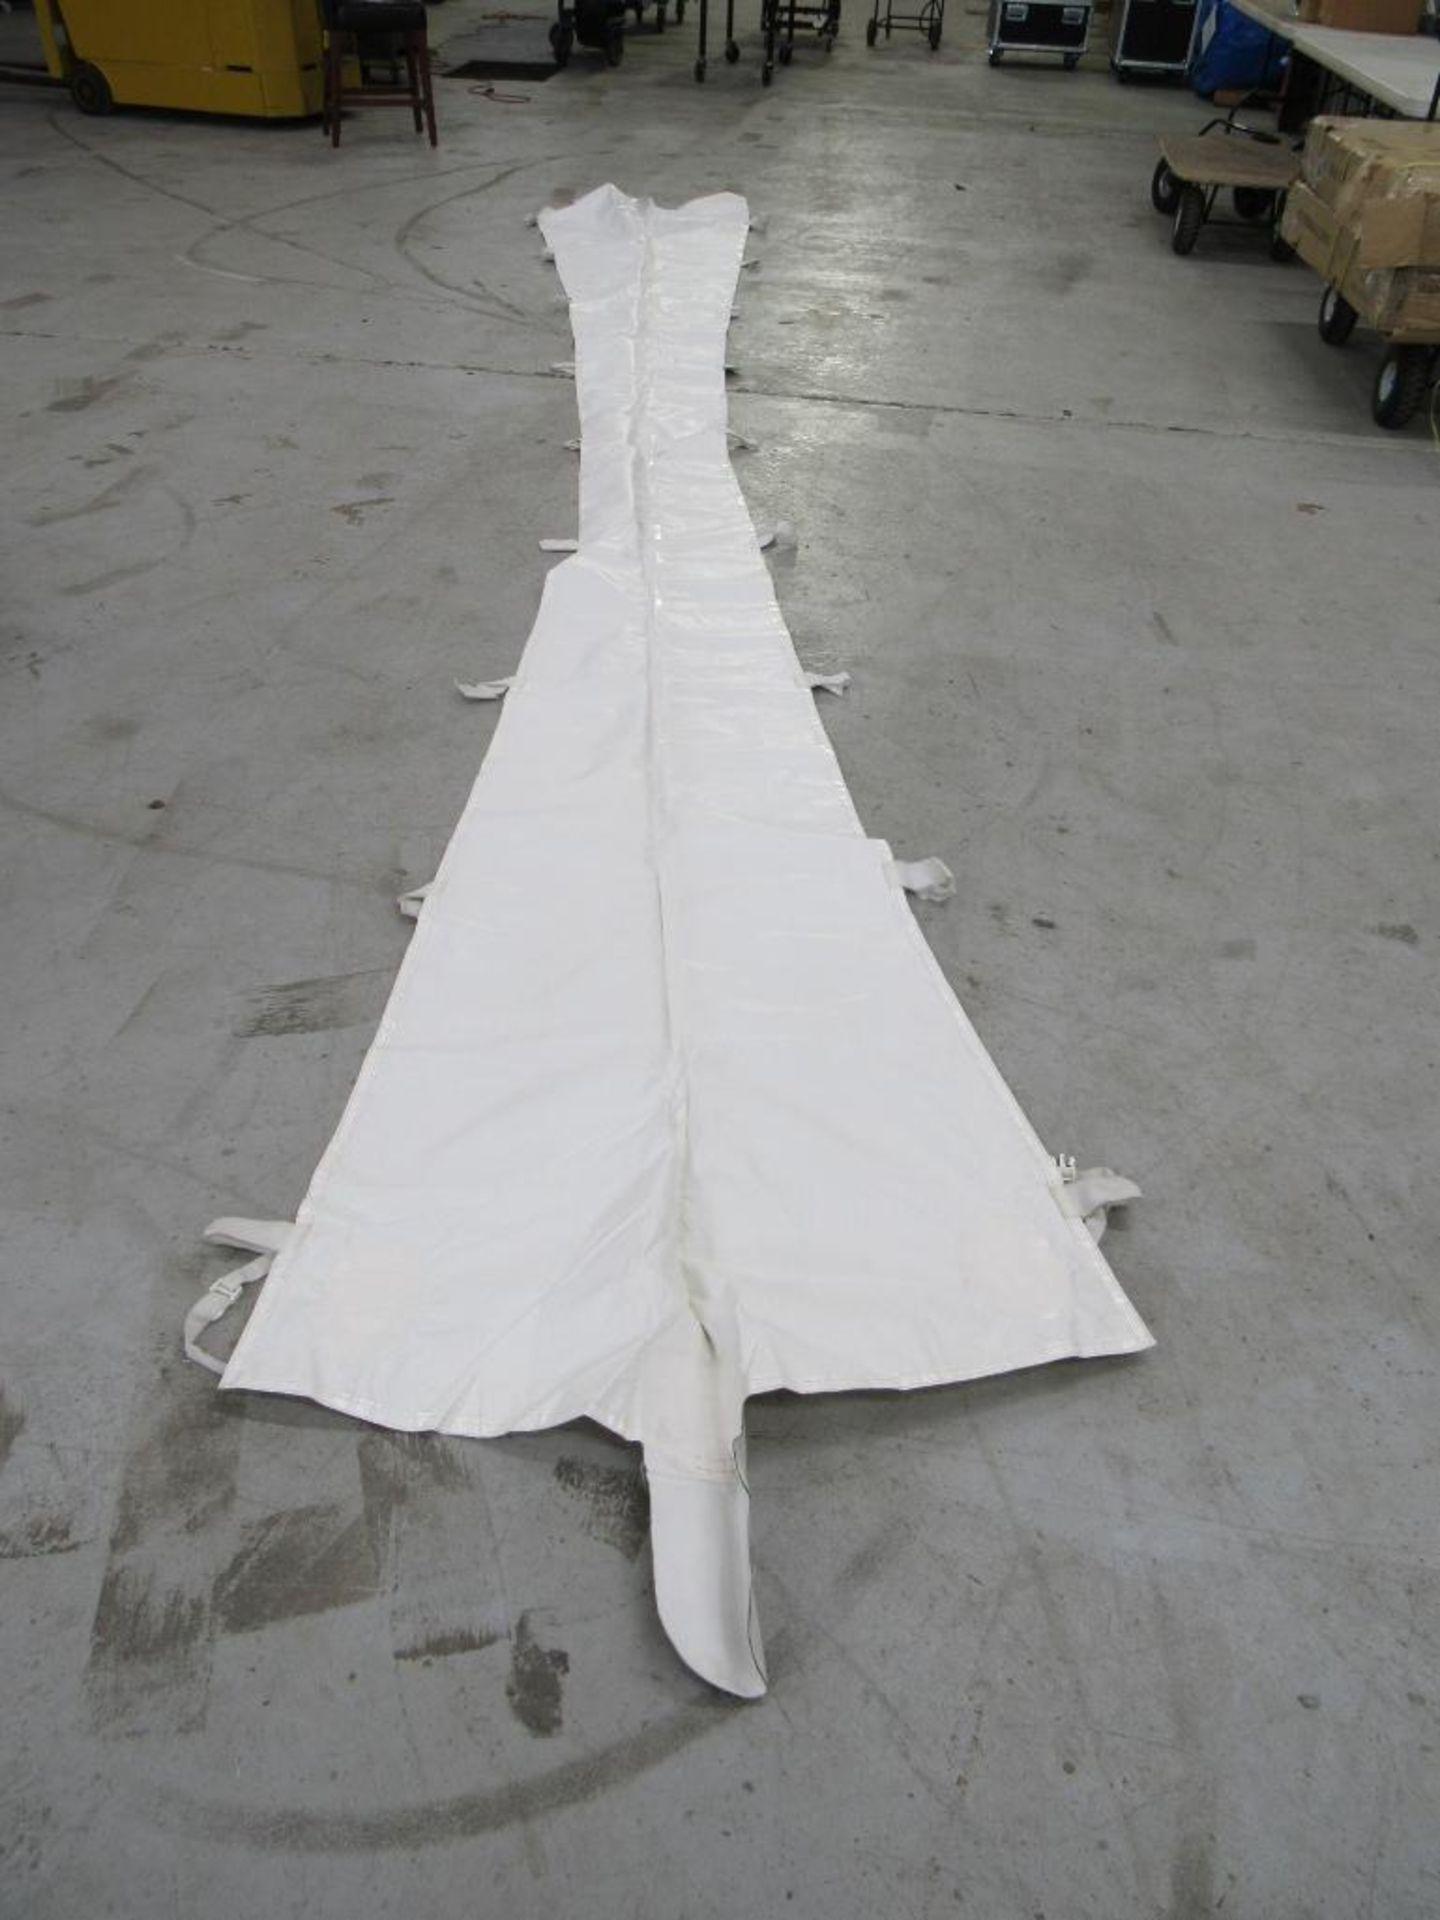 Lot 73 - PINNACLE Rain Gutters, 20 ft. Tent (2) Pieces